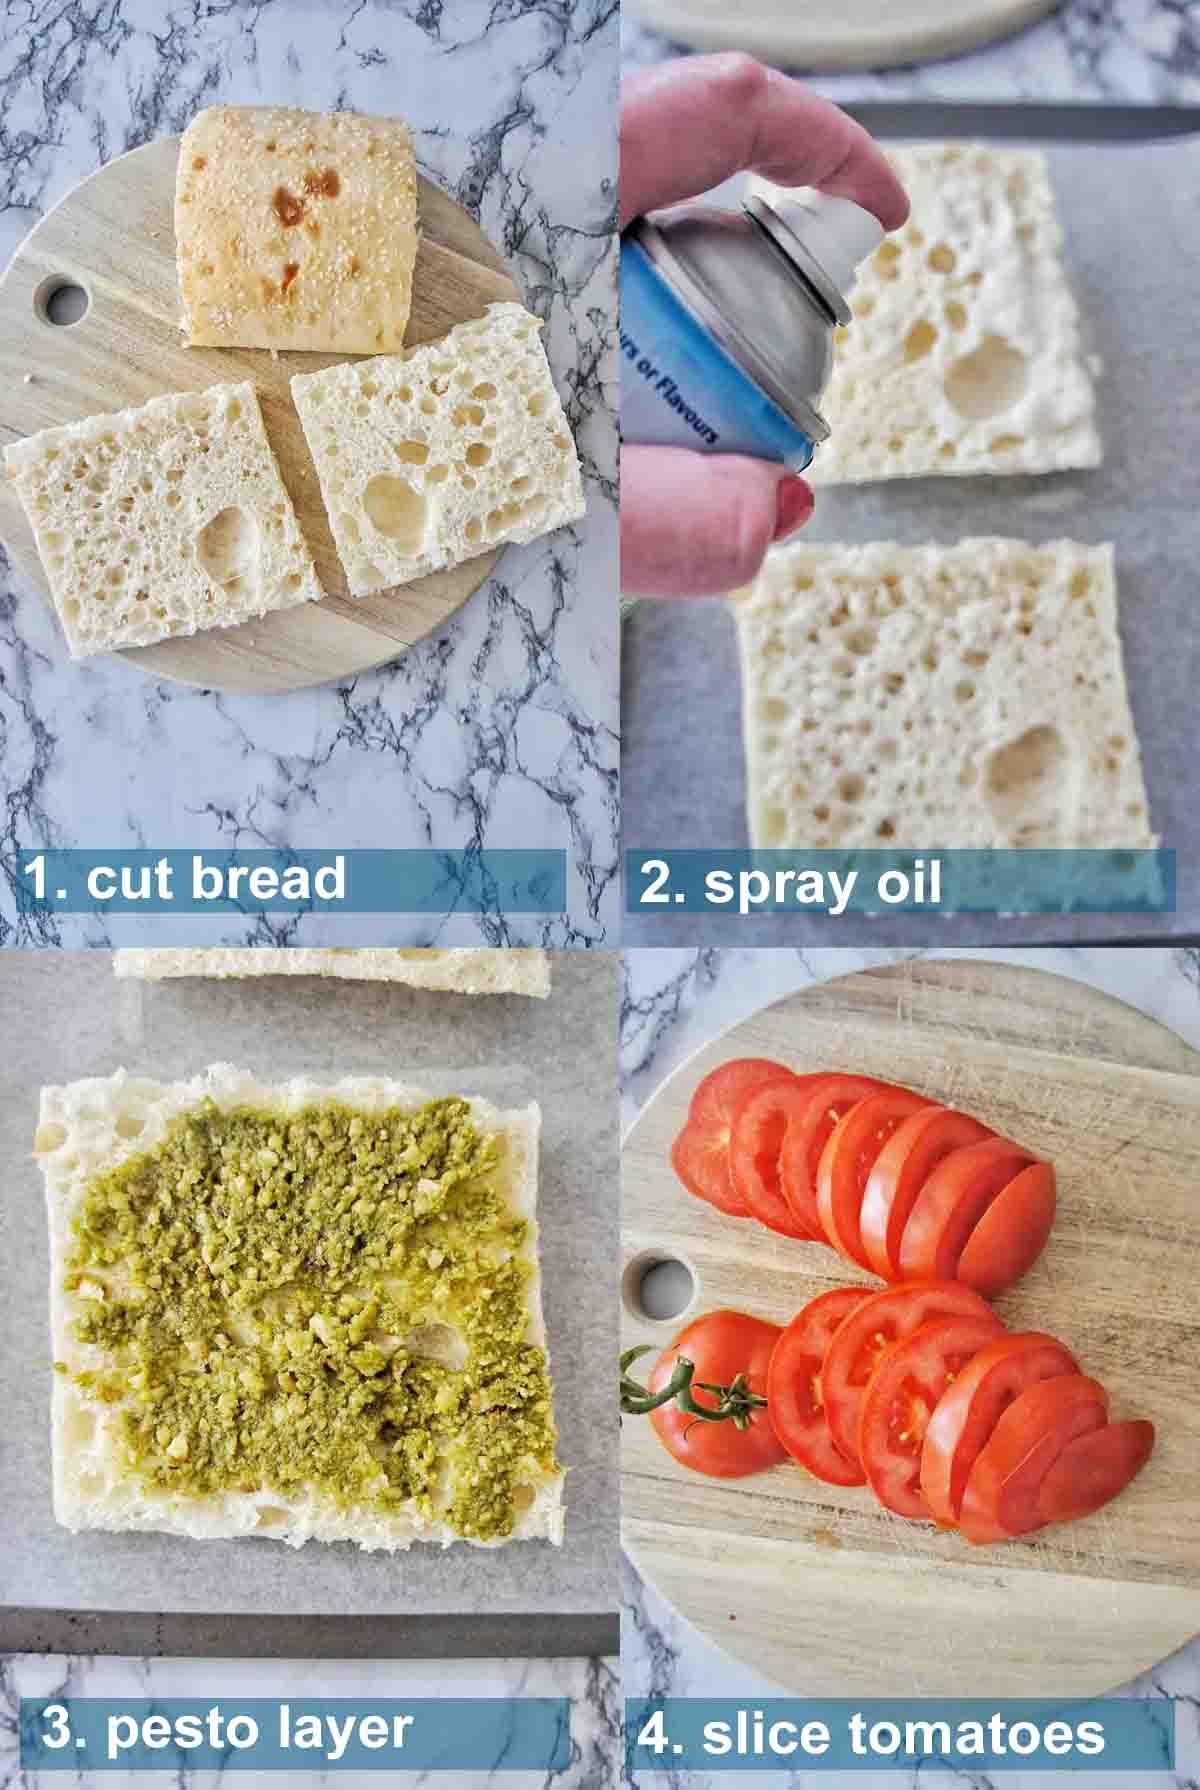 Pesto Grilled Cheese Method 1